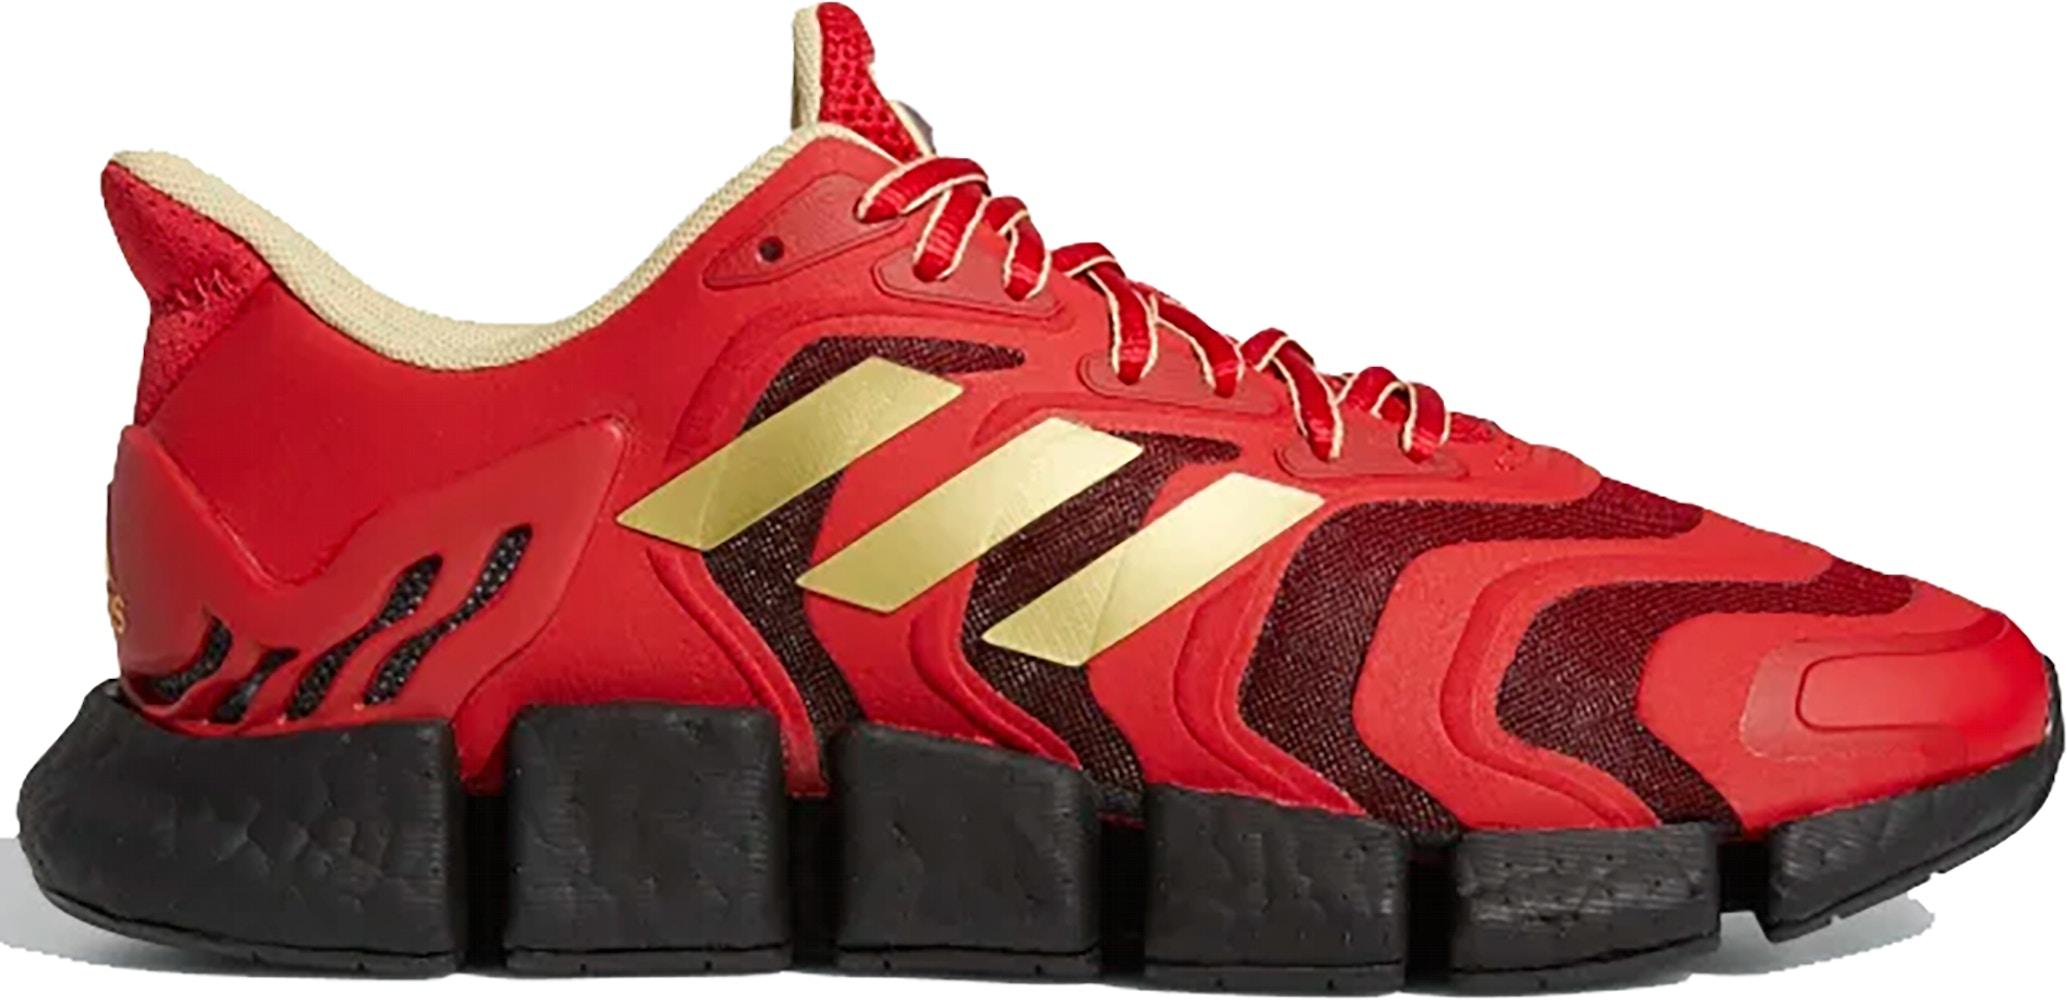 adidas Climacool Vento Scarlet Black Gold